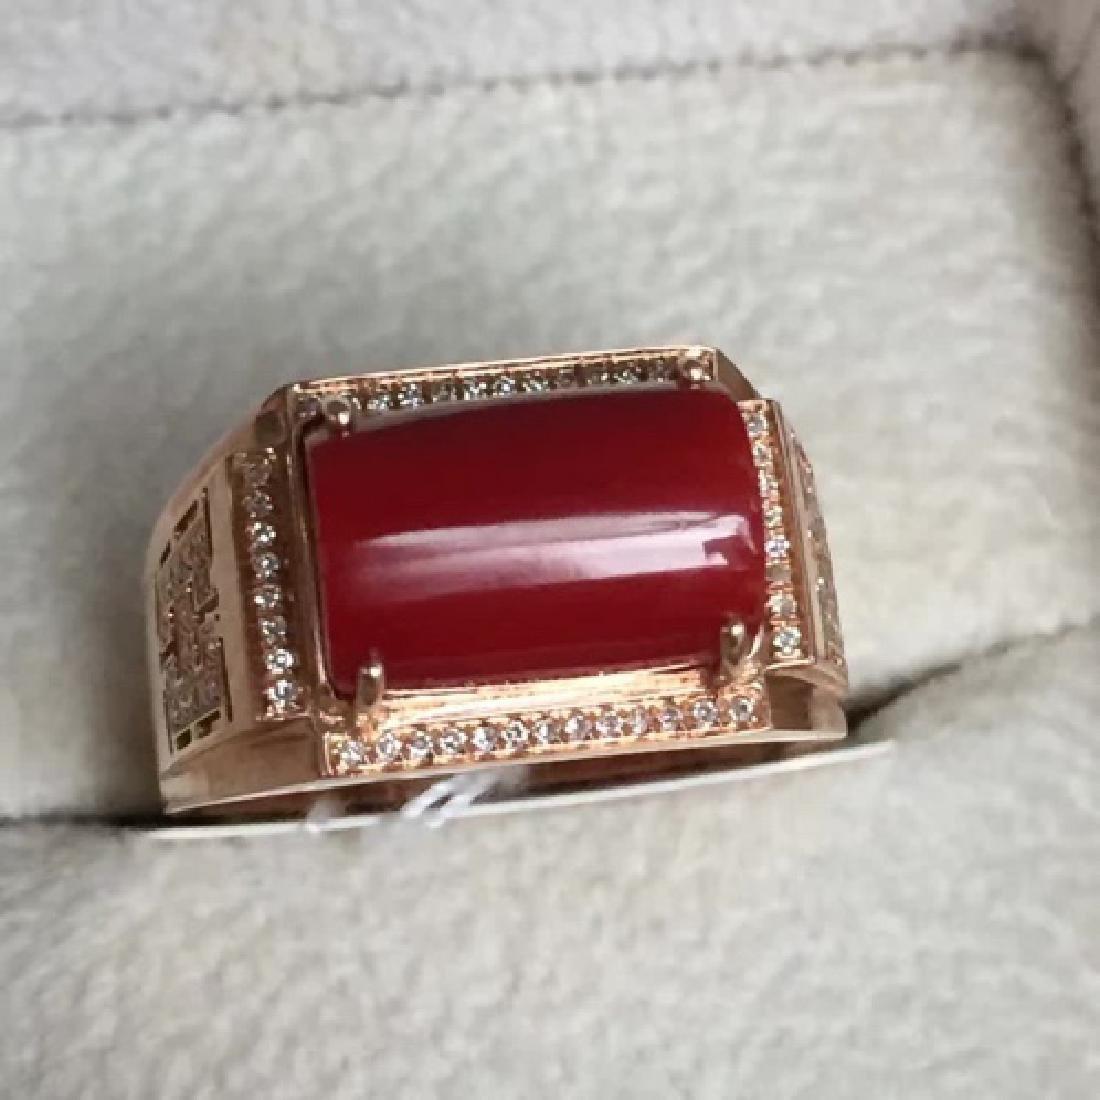 18K AKA MALE RING WITH DIAMOND